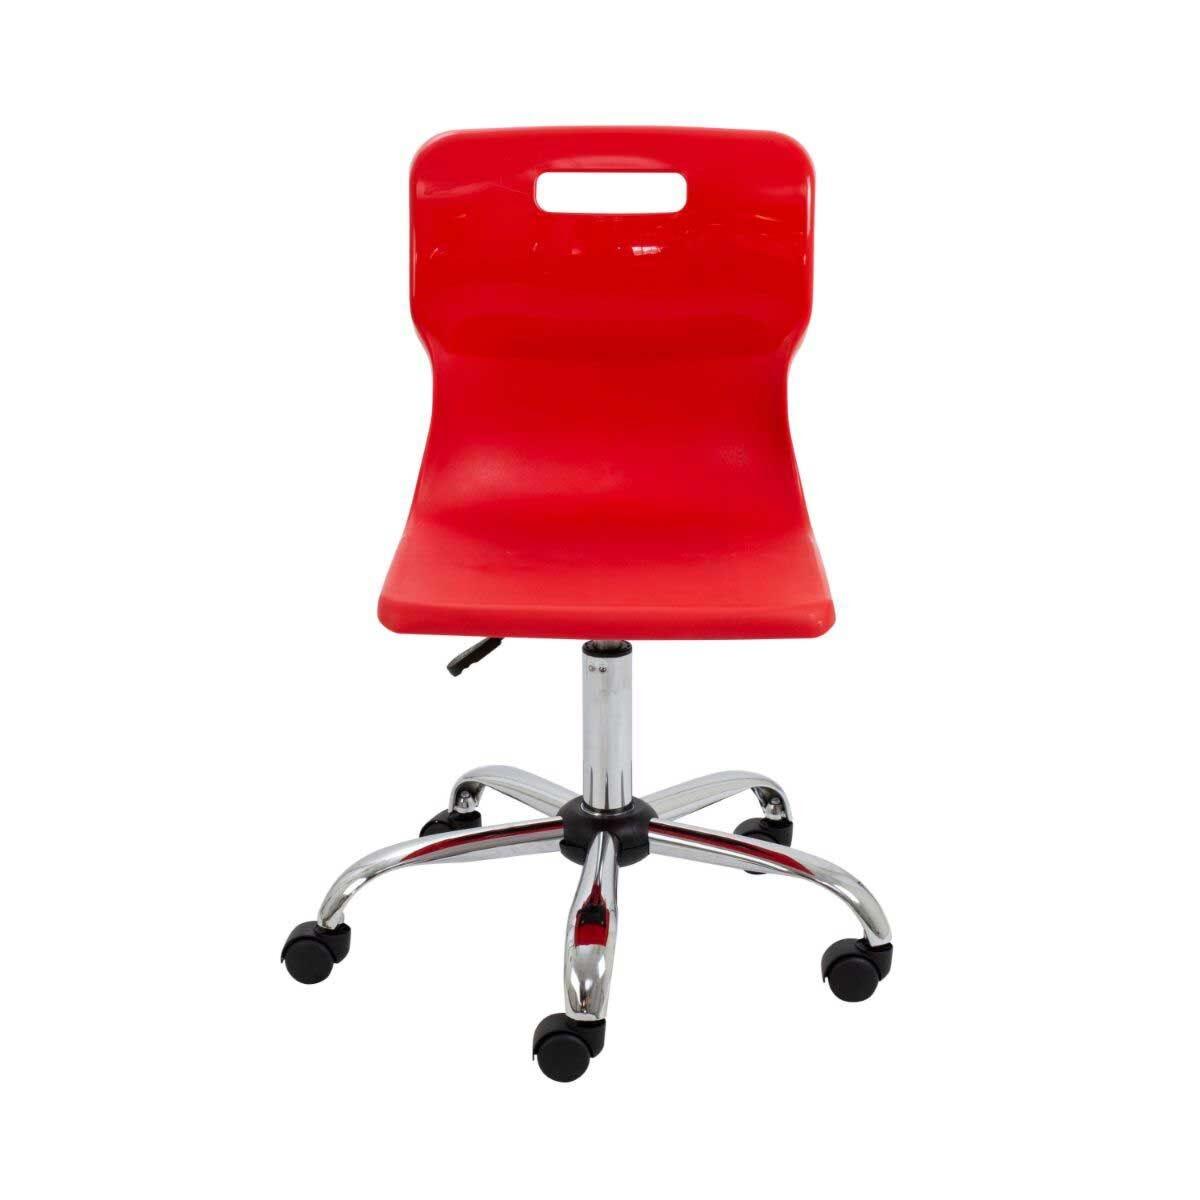 TC Office Titan Swivel Senior Chair with Castors 435-525mm Red